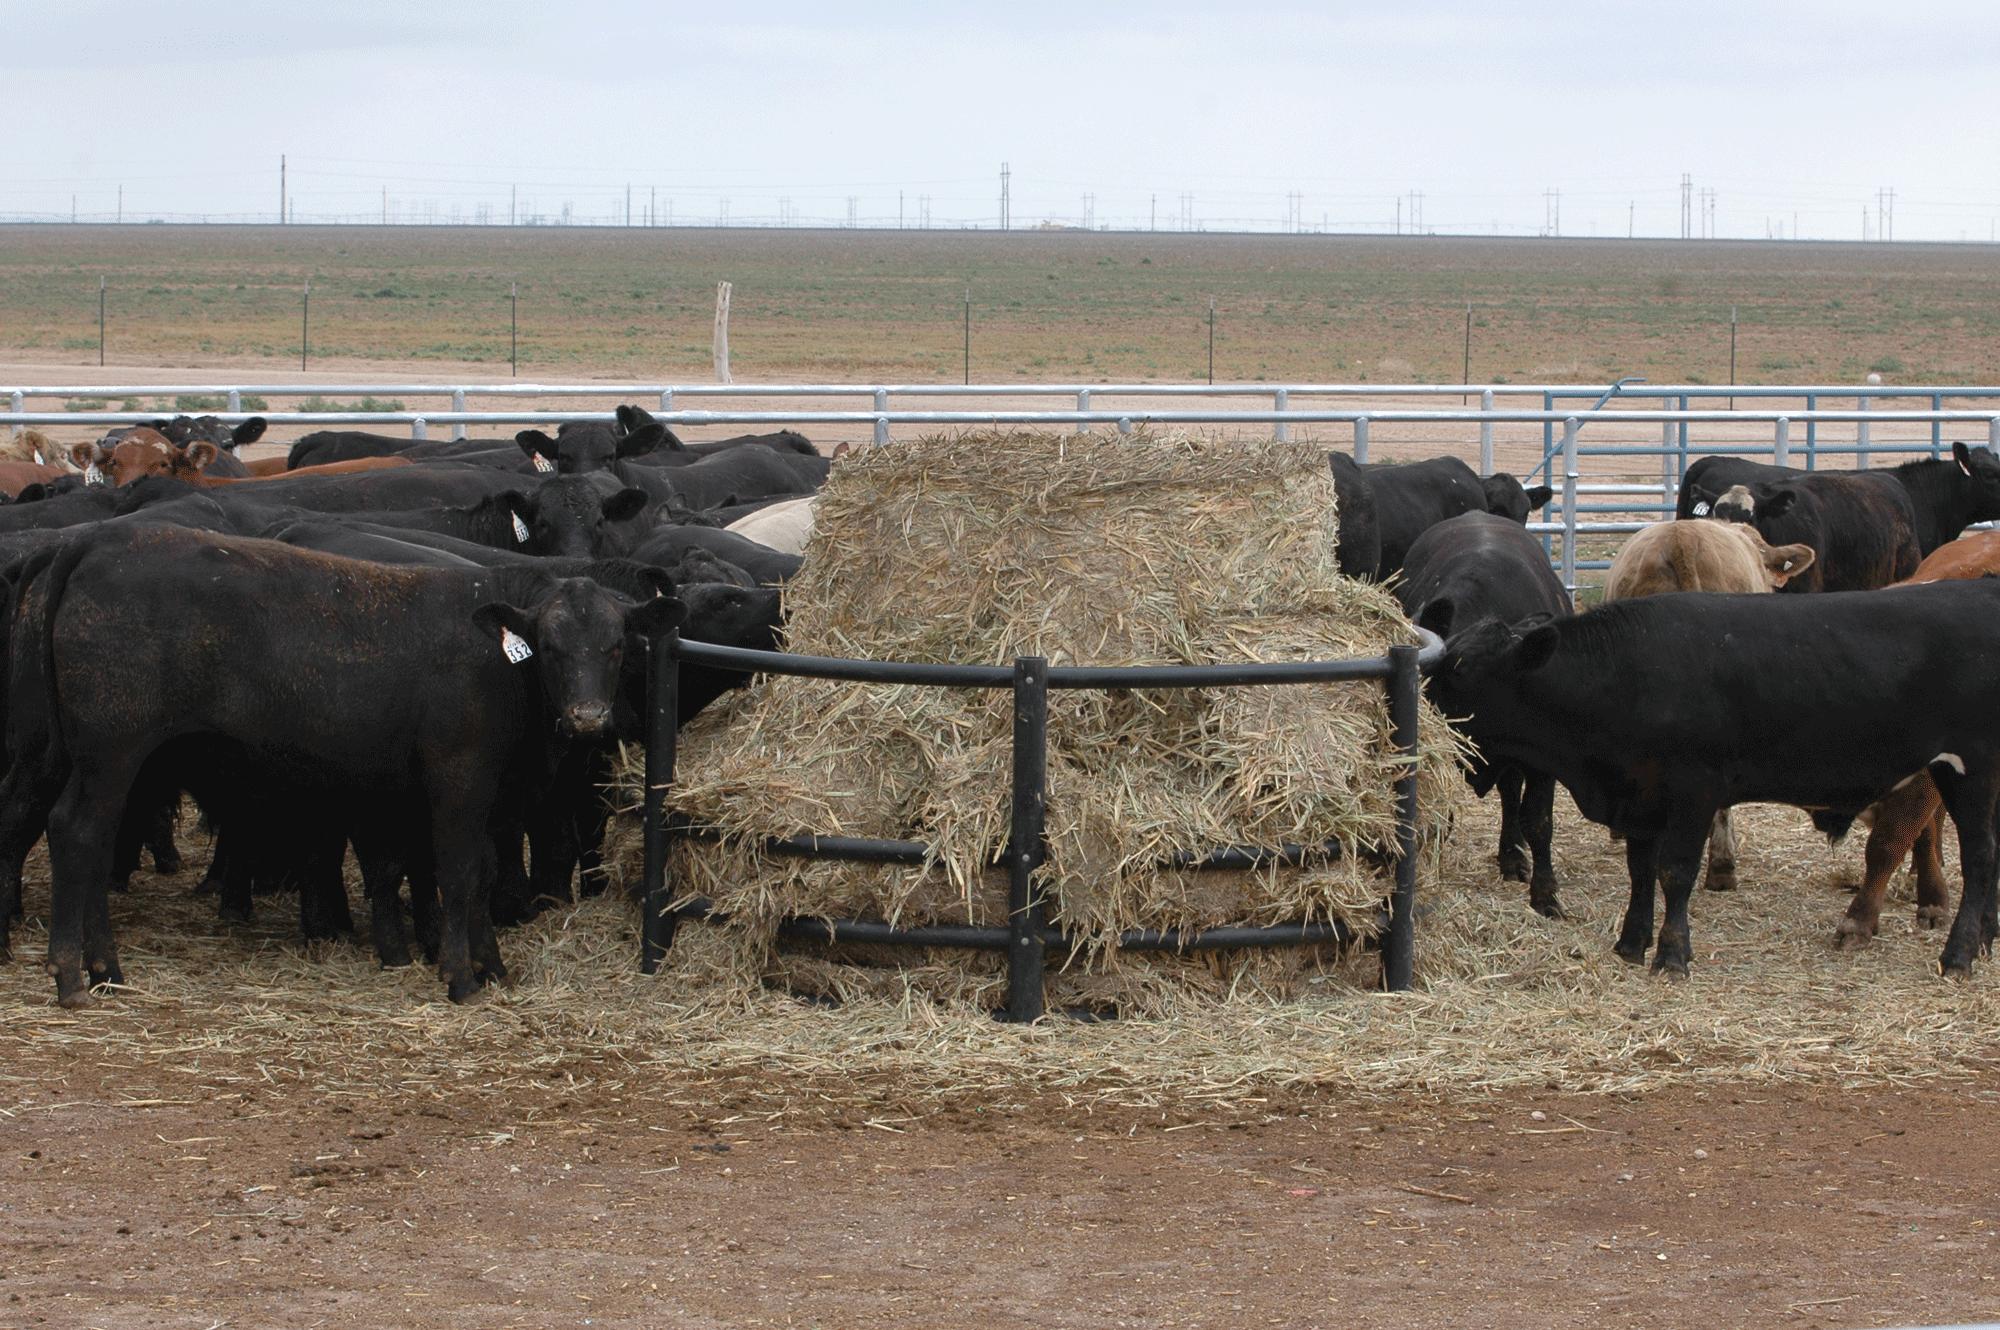 2017 spring born calves production marketing options for ranchers beef magazine. Black Bedroom Furniture Sets. Home Design Ideas